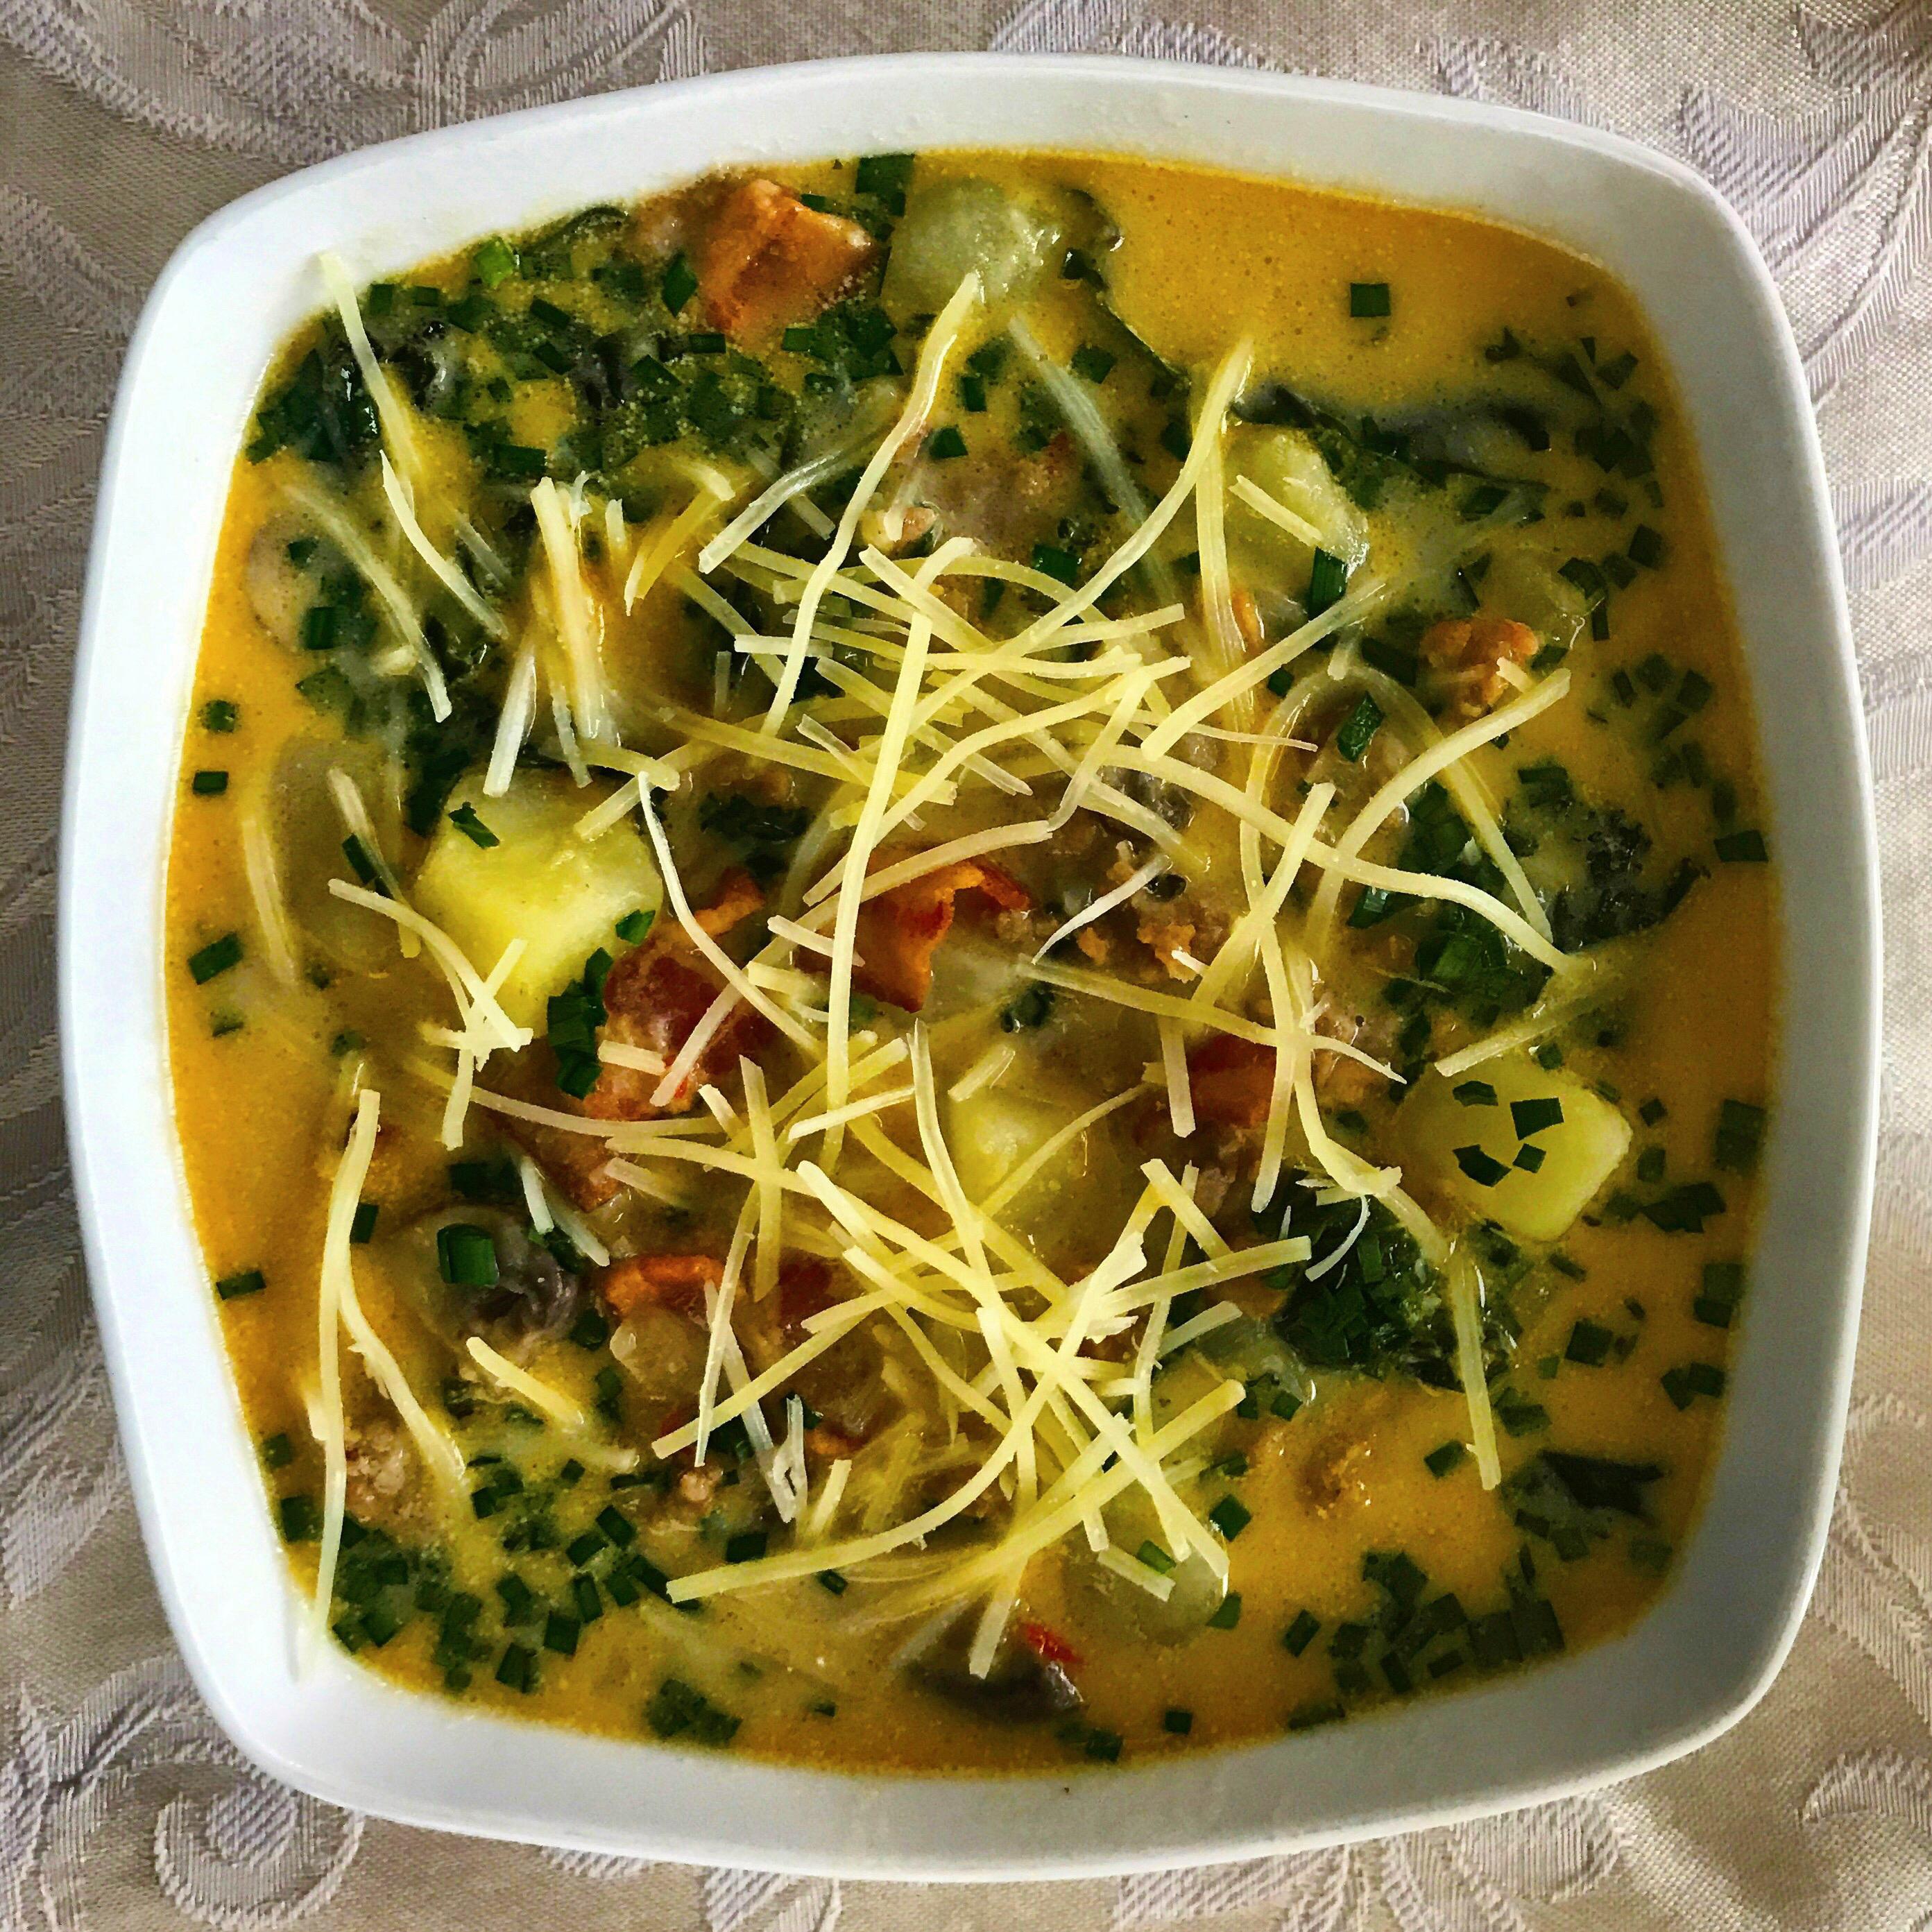 Super-Delicious Zuppa Toscana Bo_mcmillan